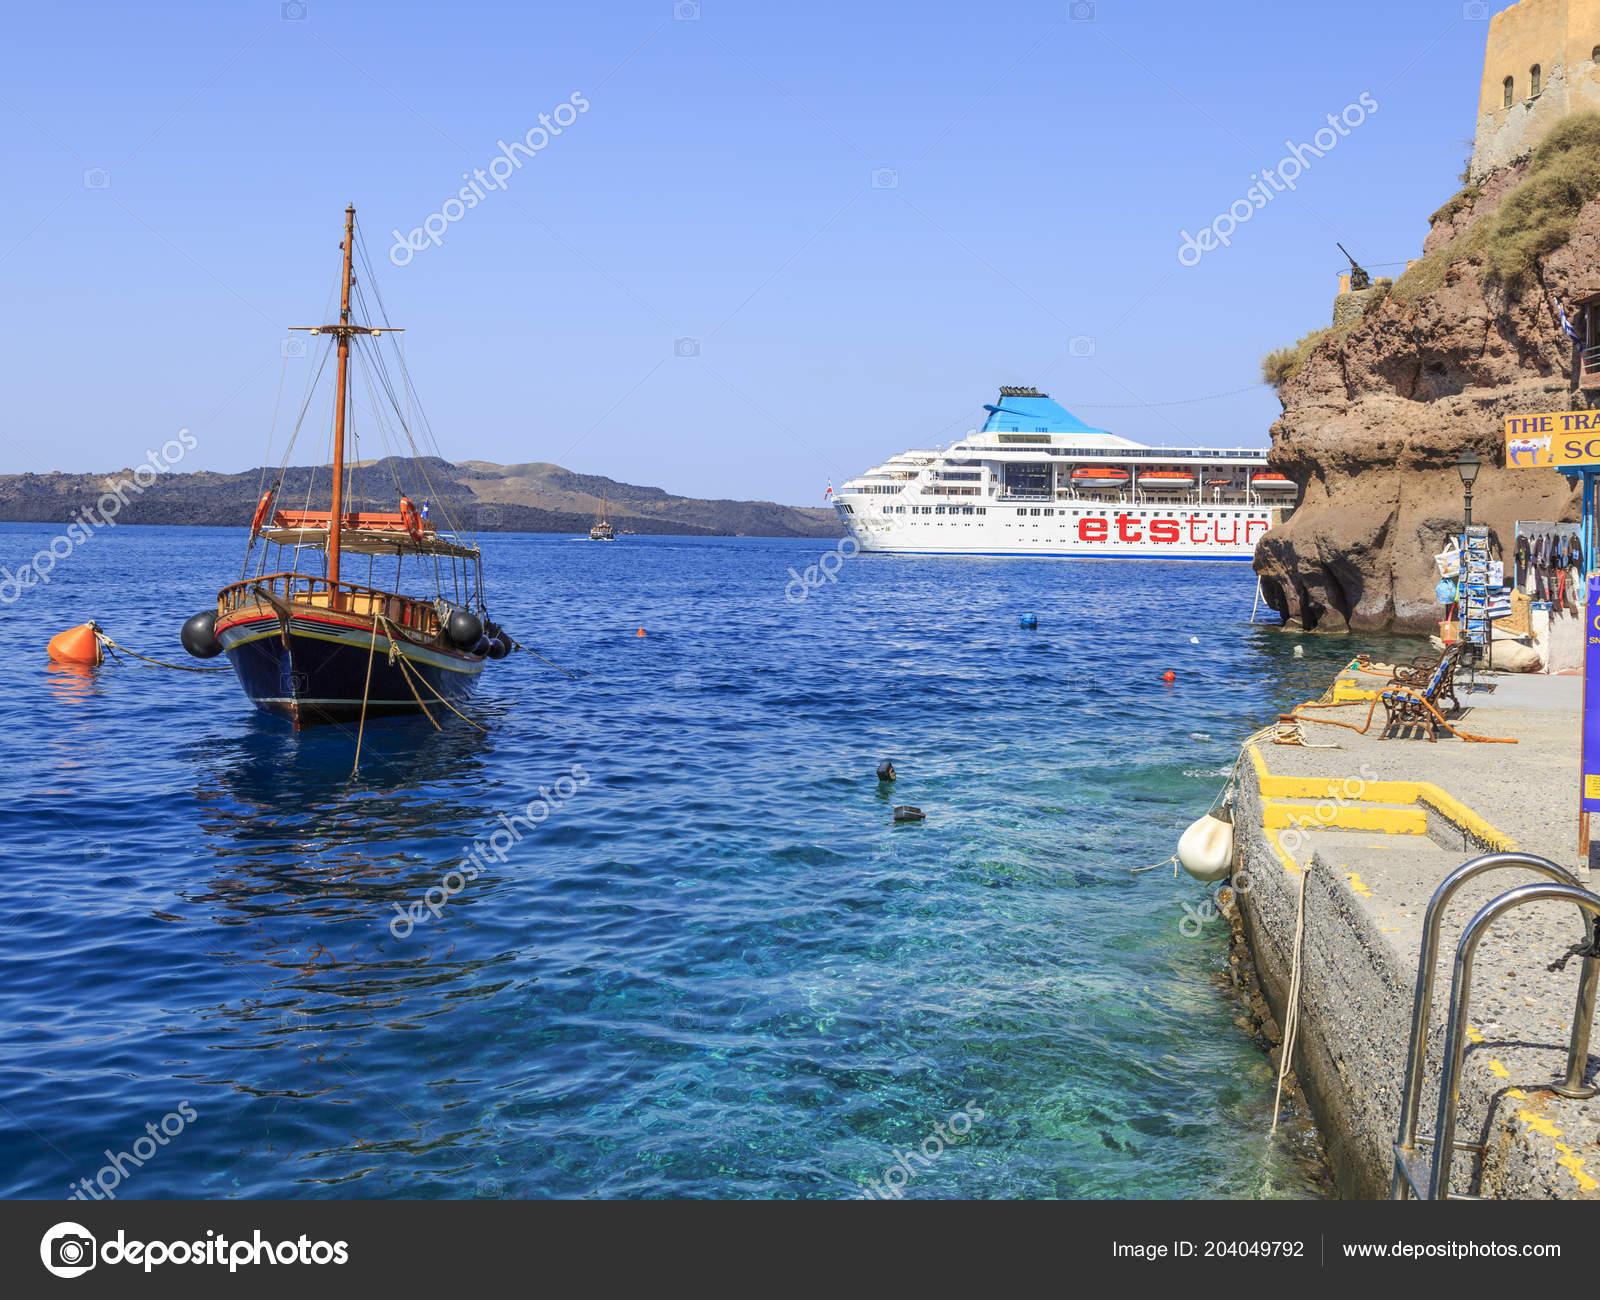 santorini greece july 2018 view ets tur cruise ship port stock